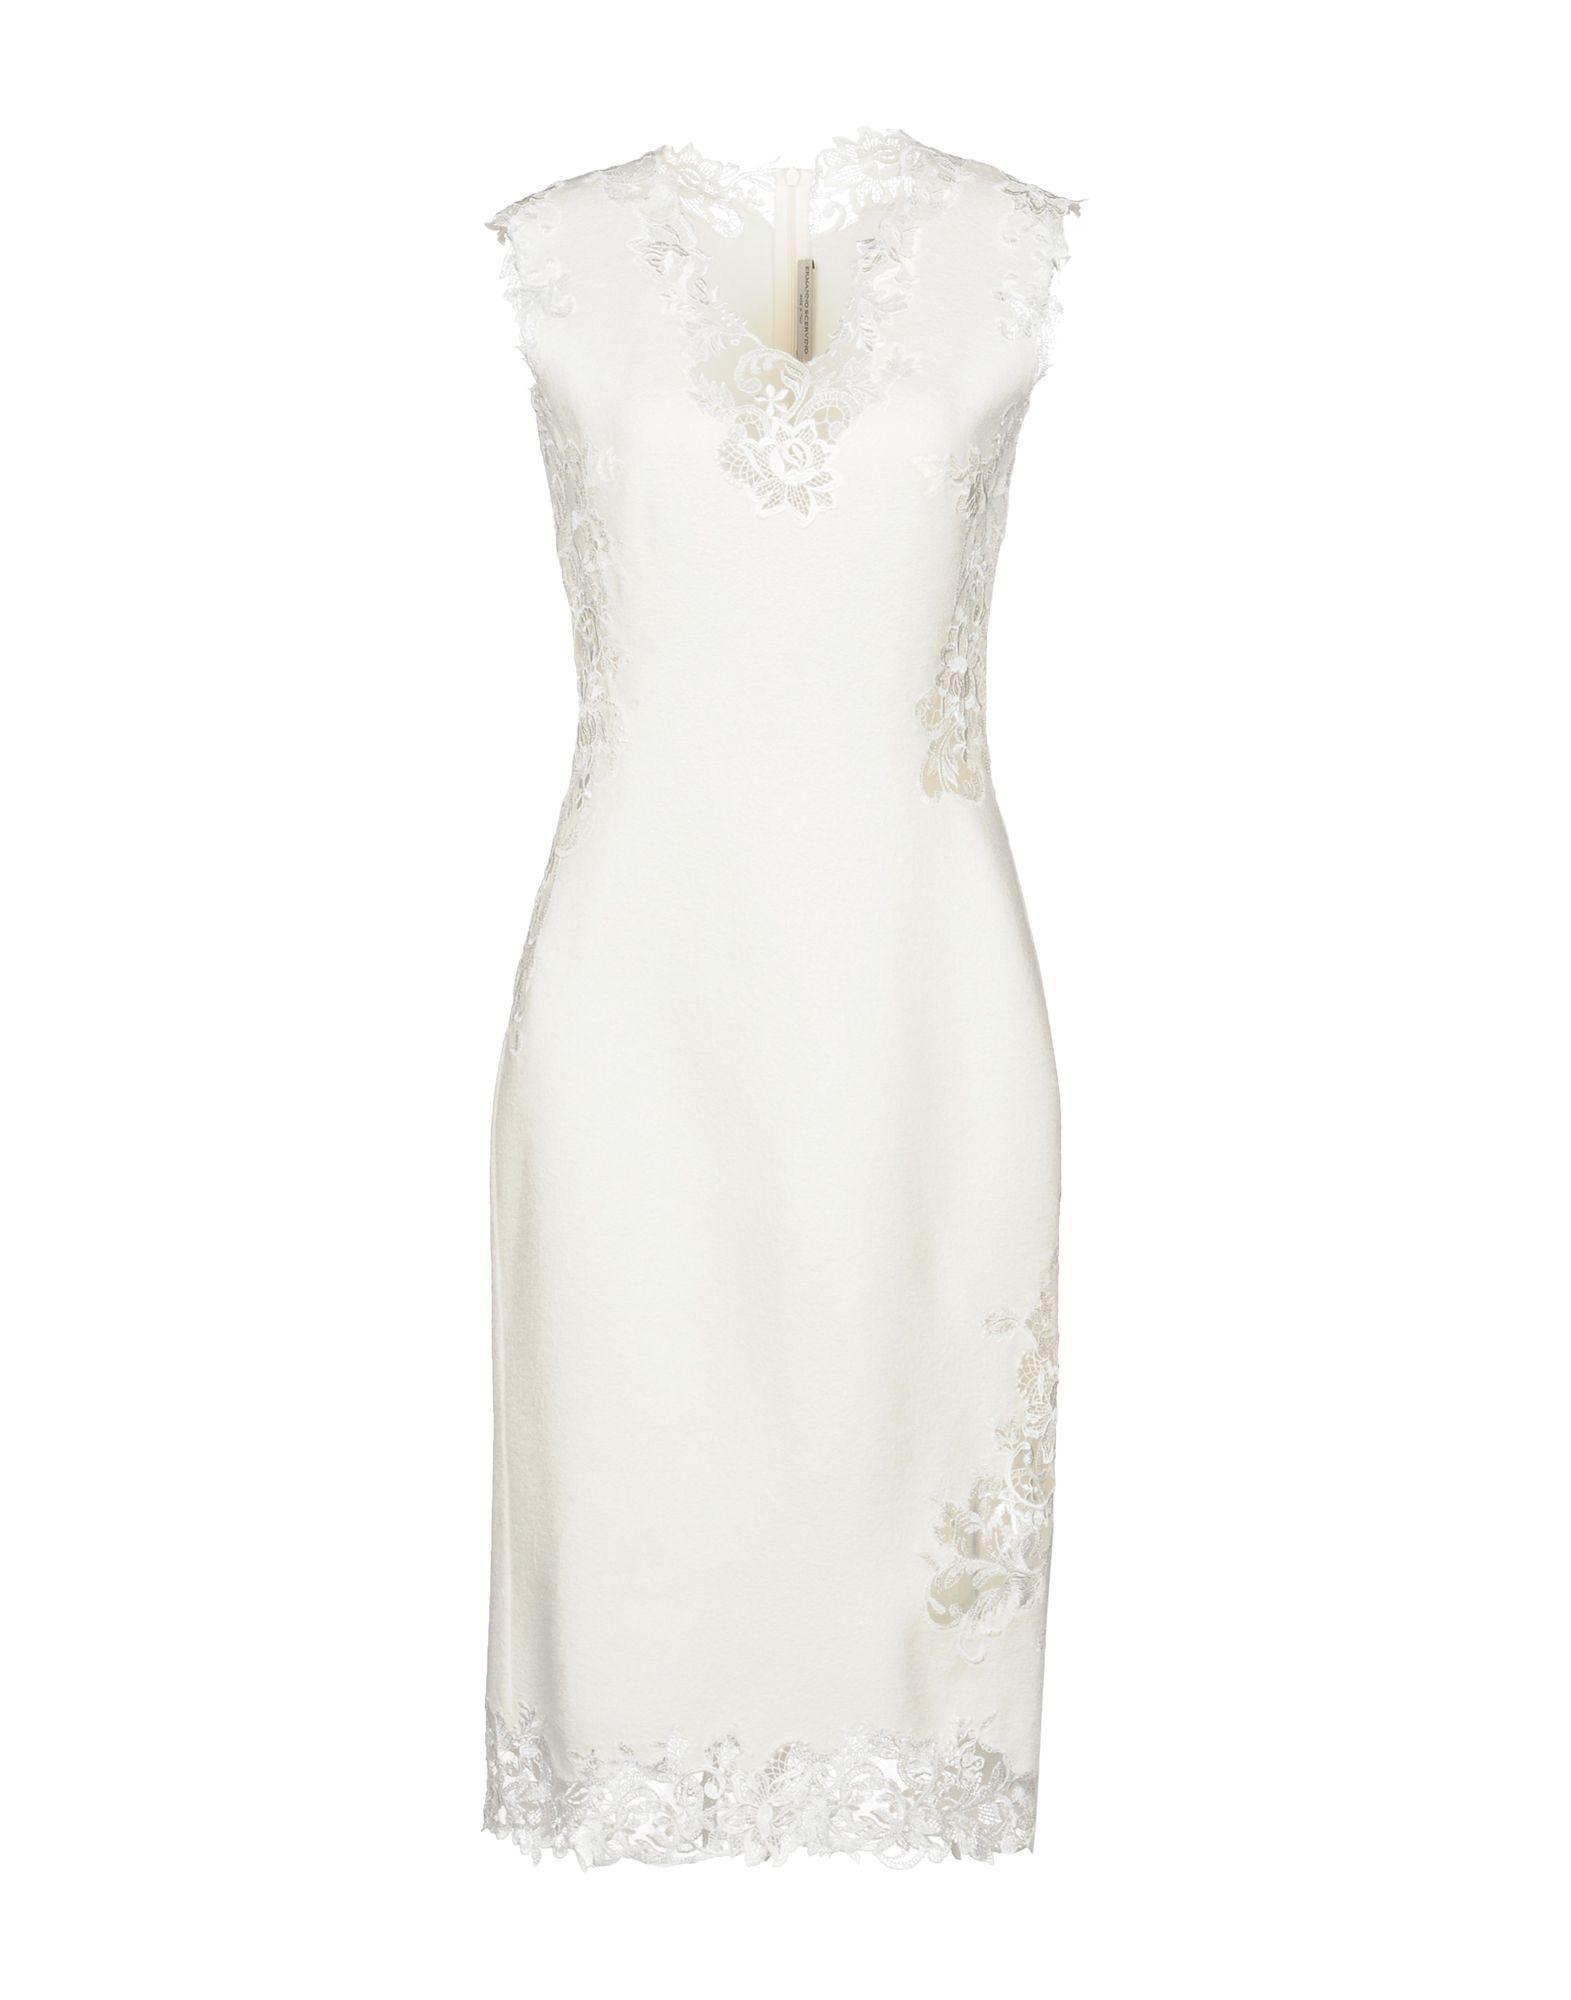 Ermanno Scervino Knee-length Dress In Ivory